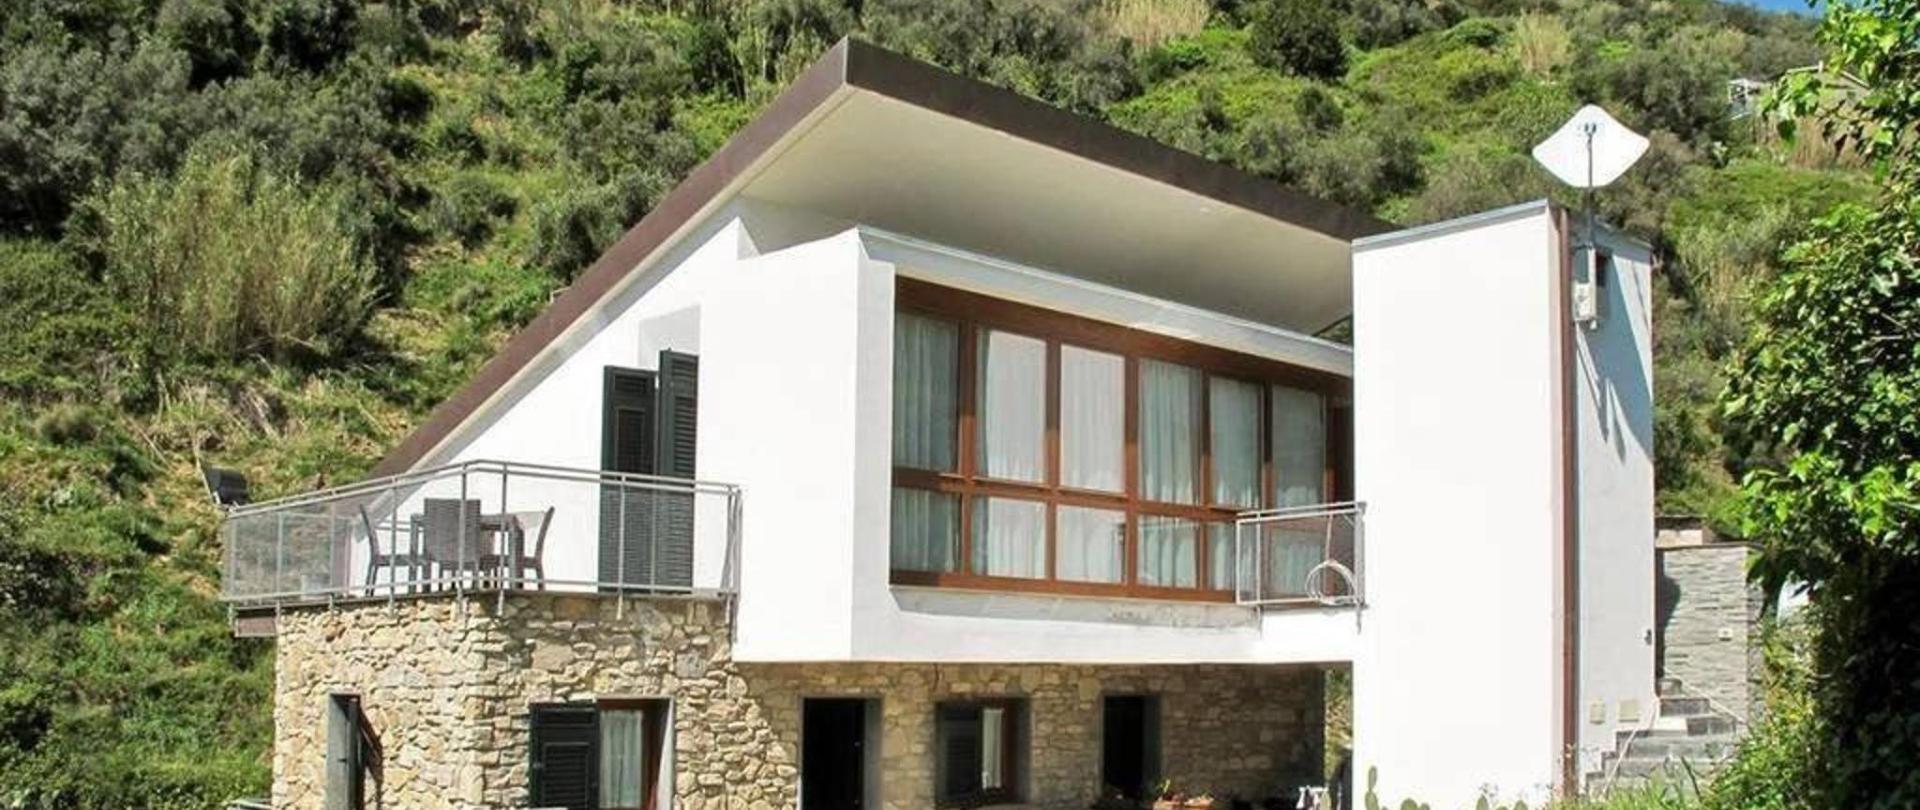 Apartments Le Terrazze - Vernazza - Italy – Apartments Le Terrazze ...